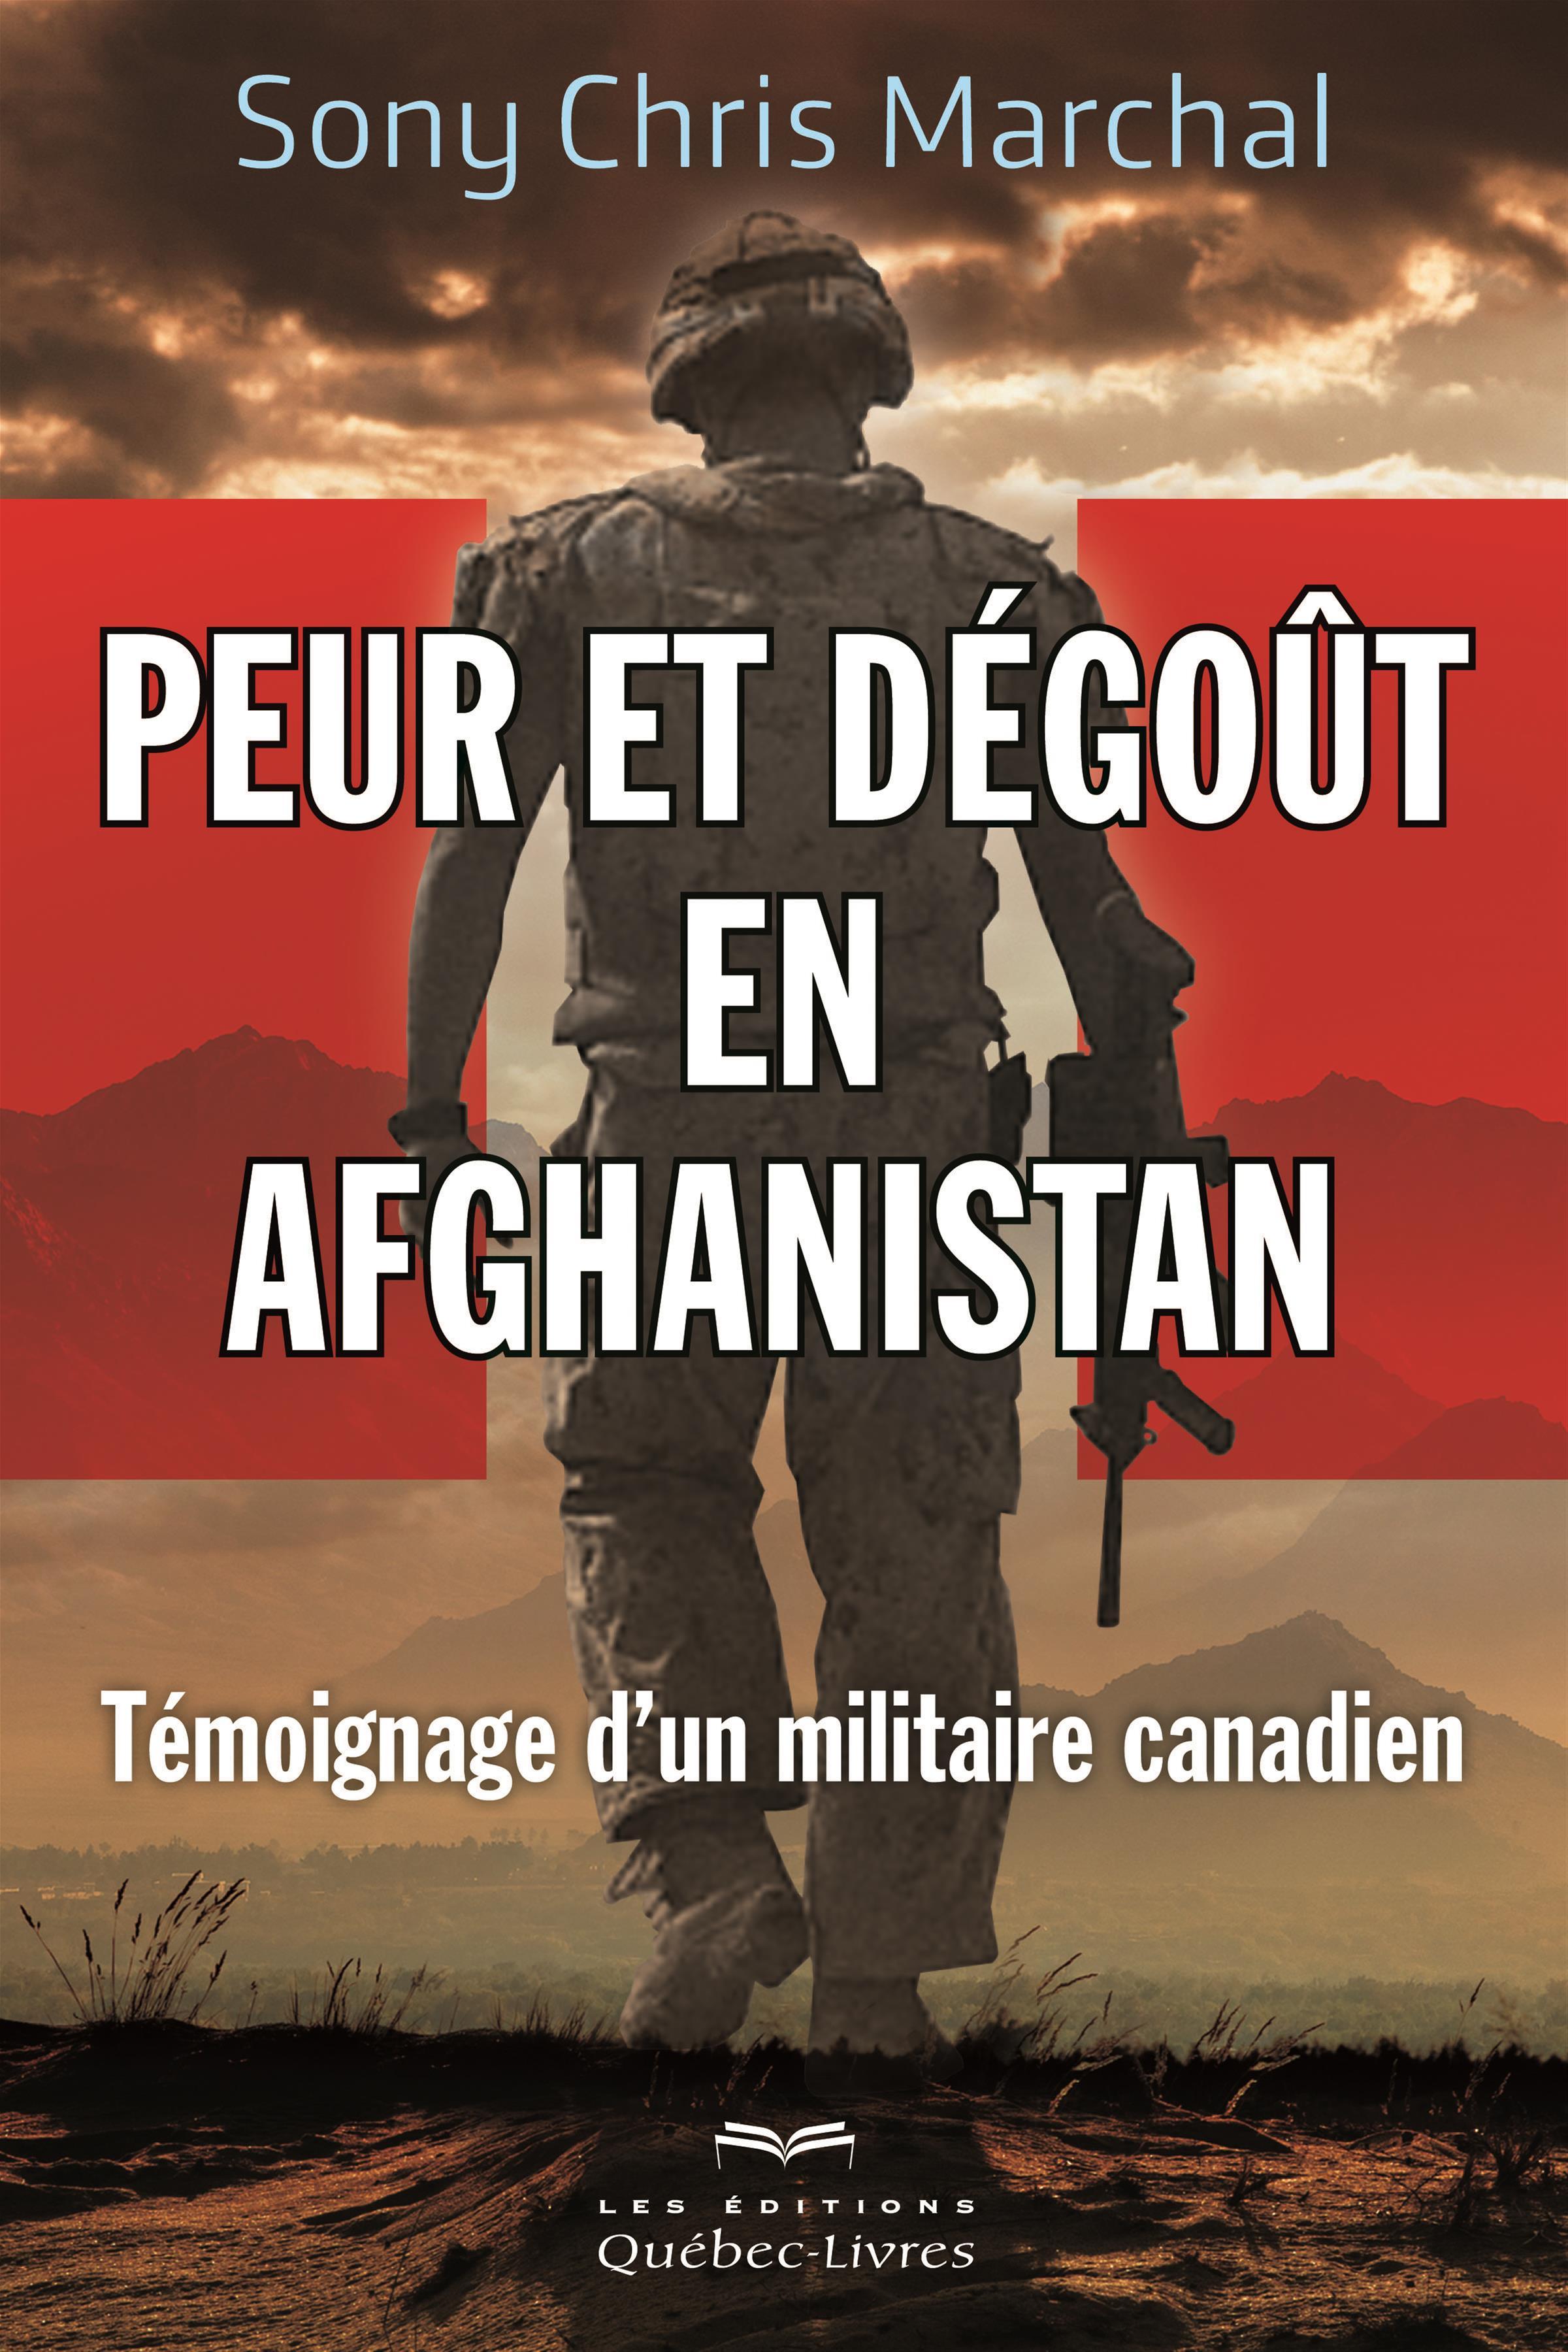 Peur et dégoût en Afghanistan